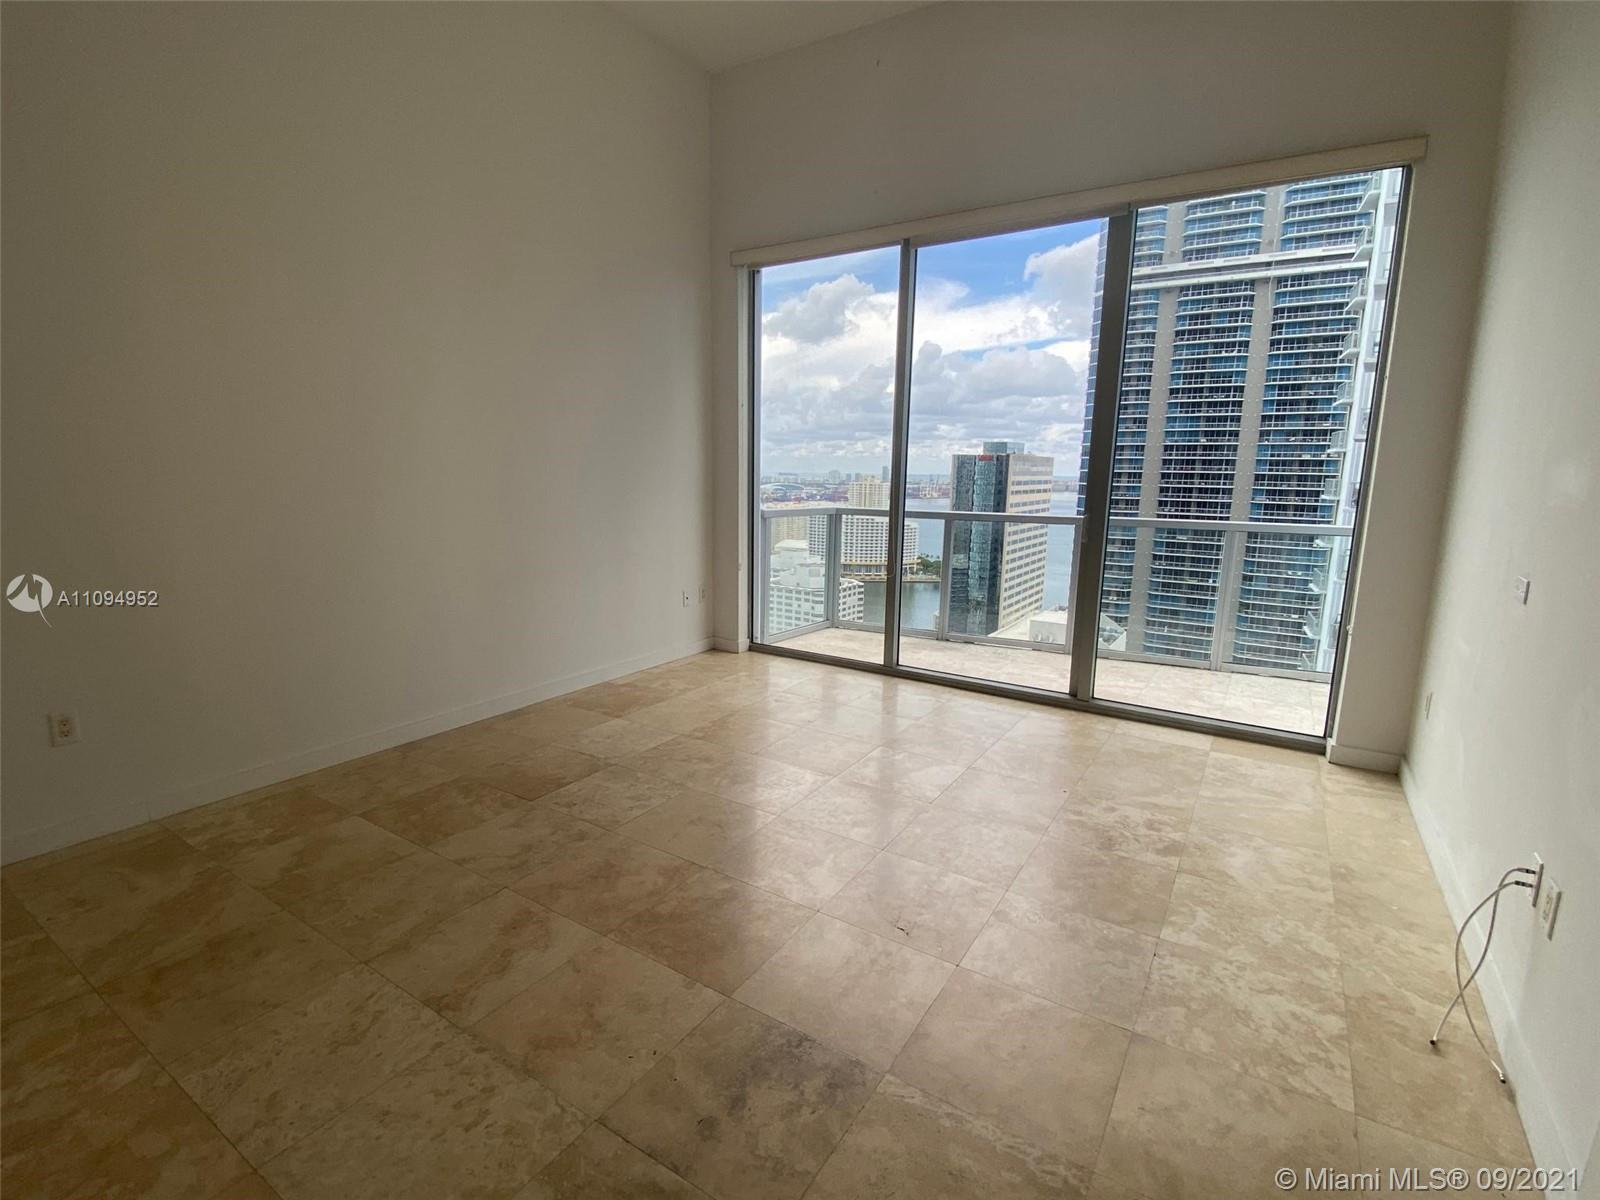 1060 Brickell East Tower #3308 - 1050 Brickell Ave. #3308, Miami, FL 33131